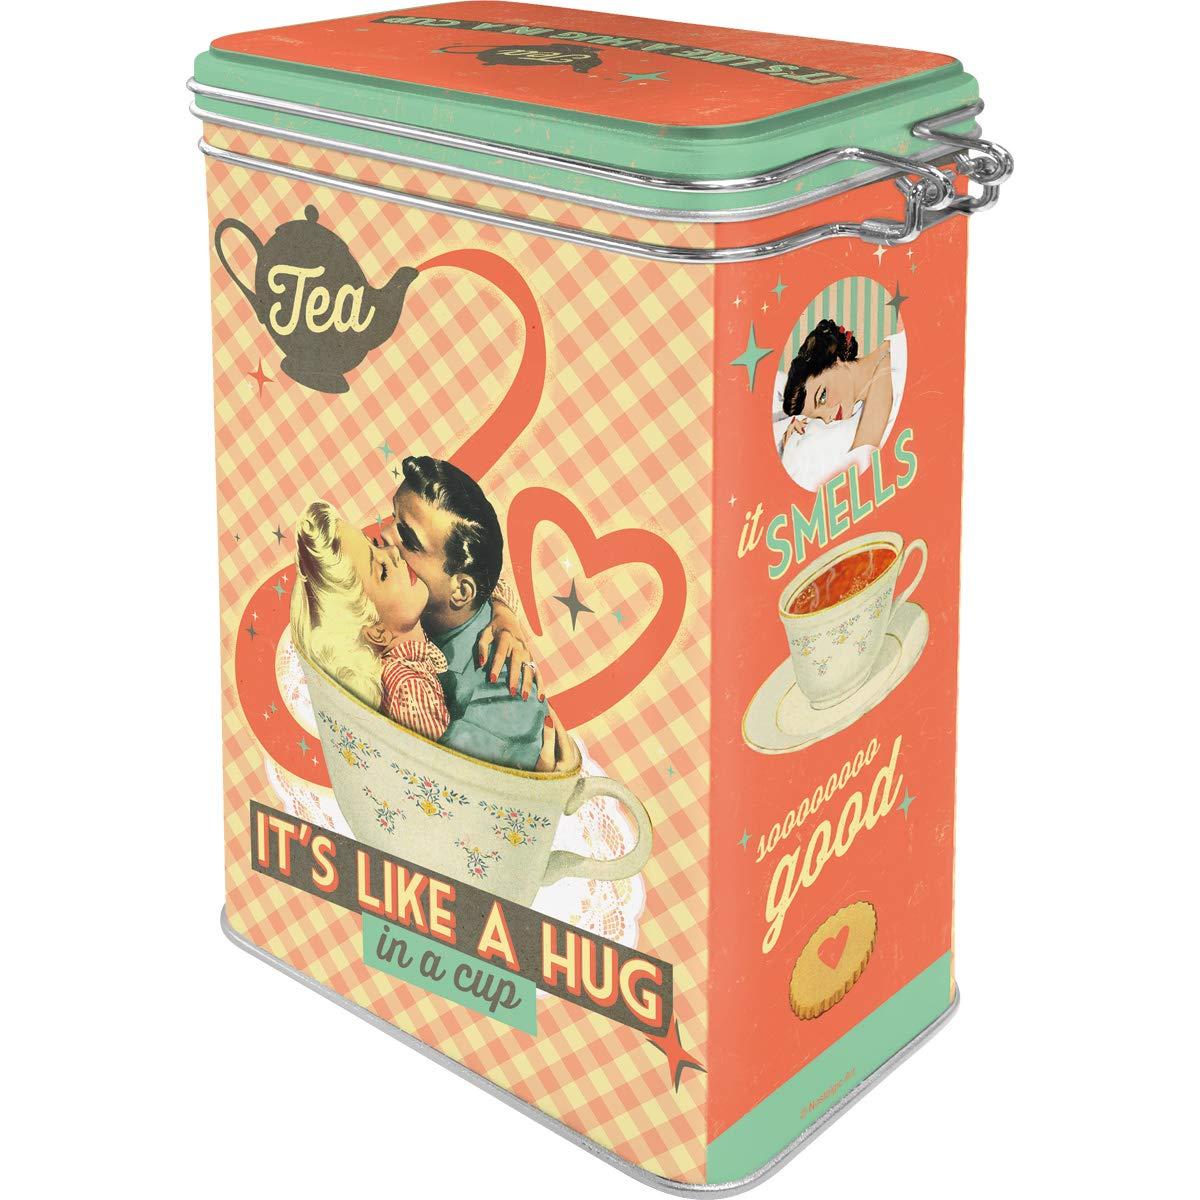 Nostalgic-Art Latas Say it 50s Say It 50s 11 x 8 x 18 cm Tea Its Like A Hug in A Cup Metal